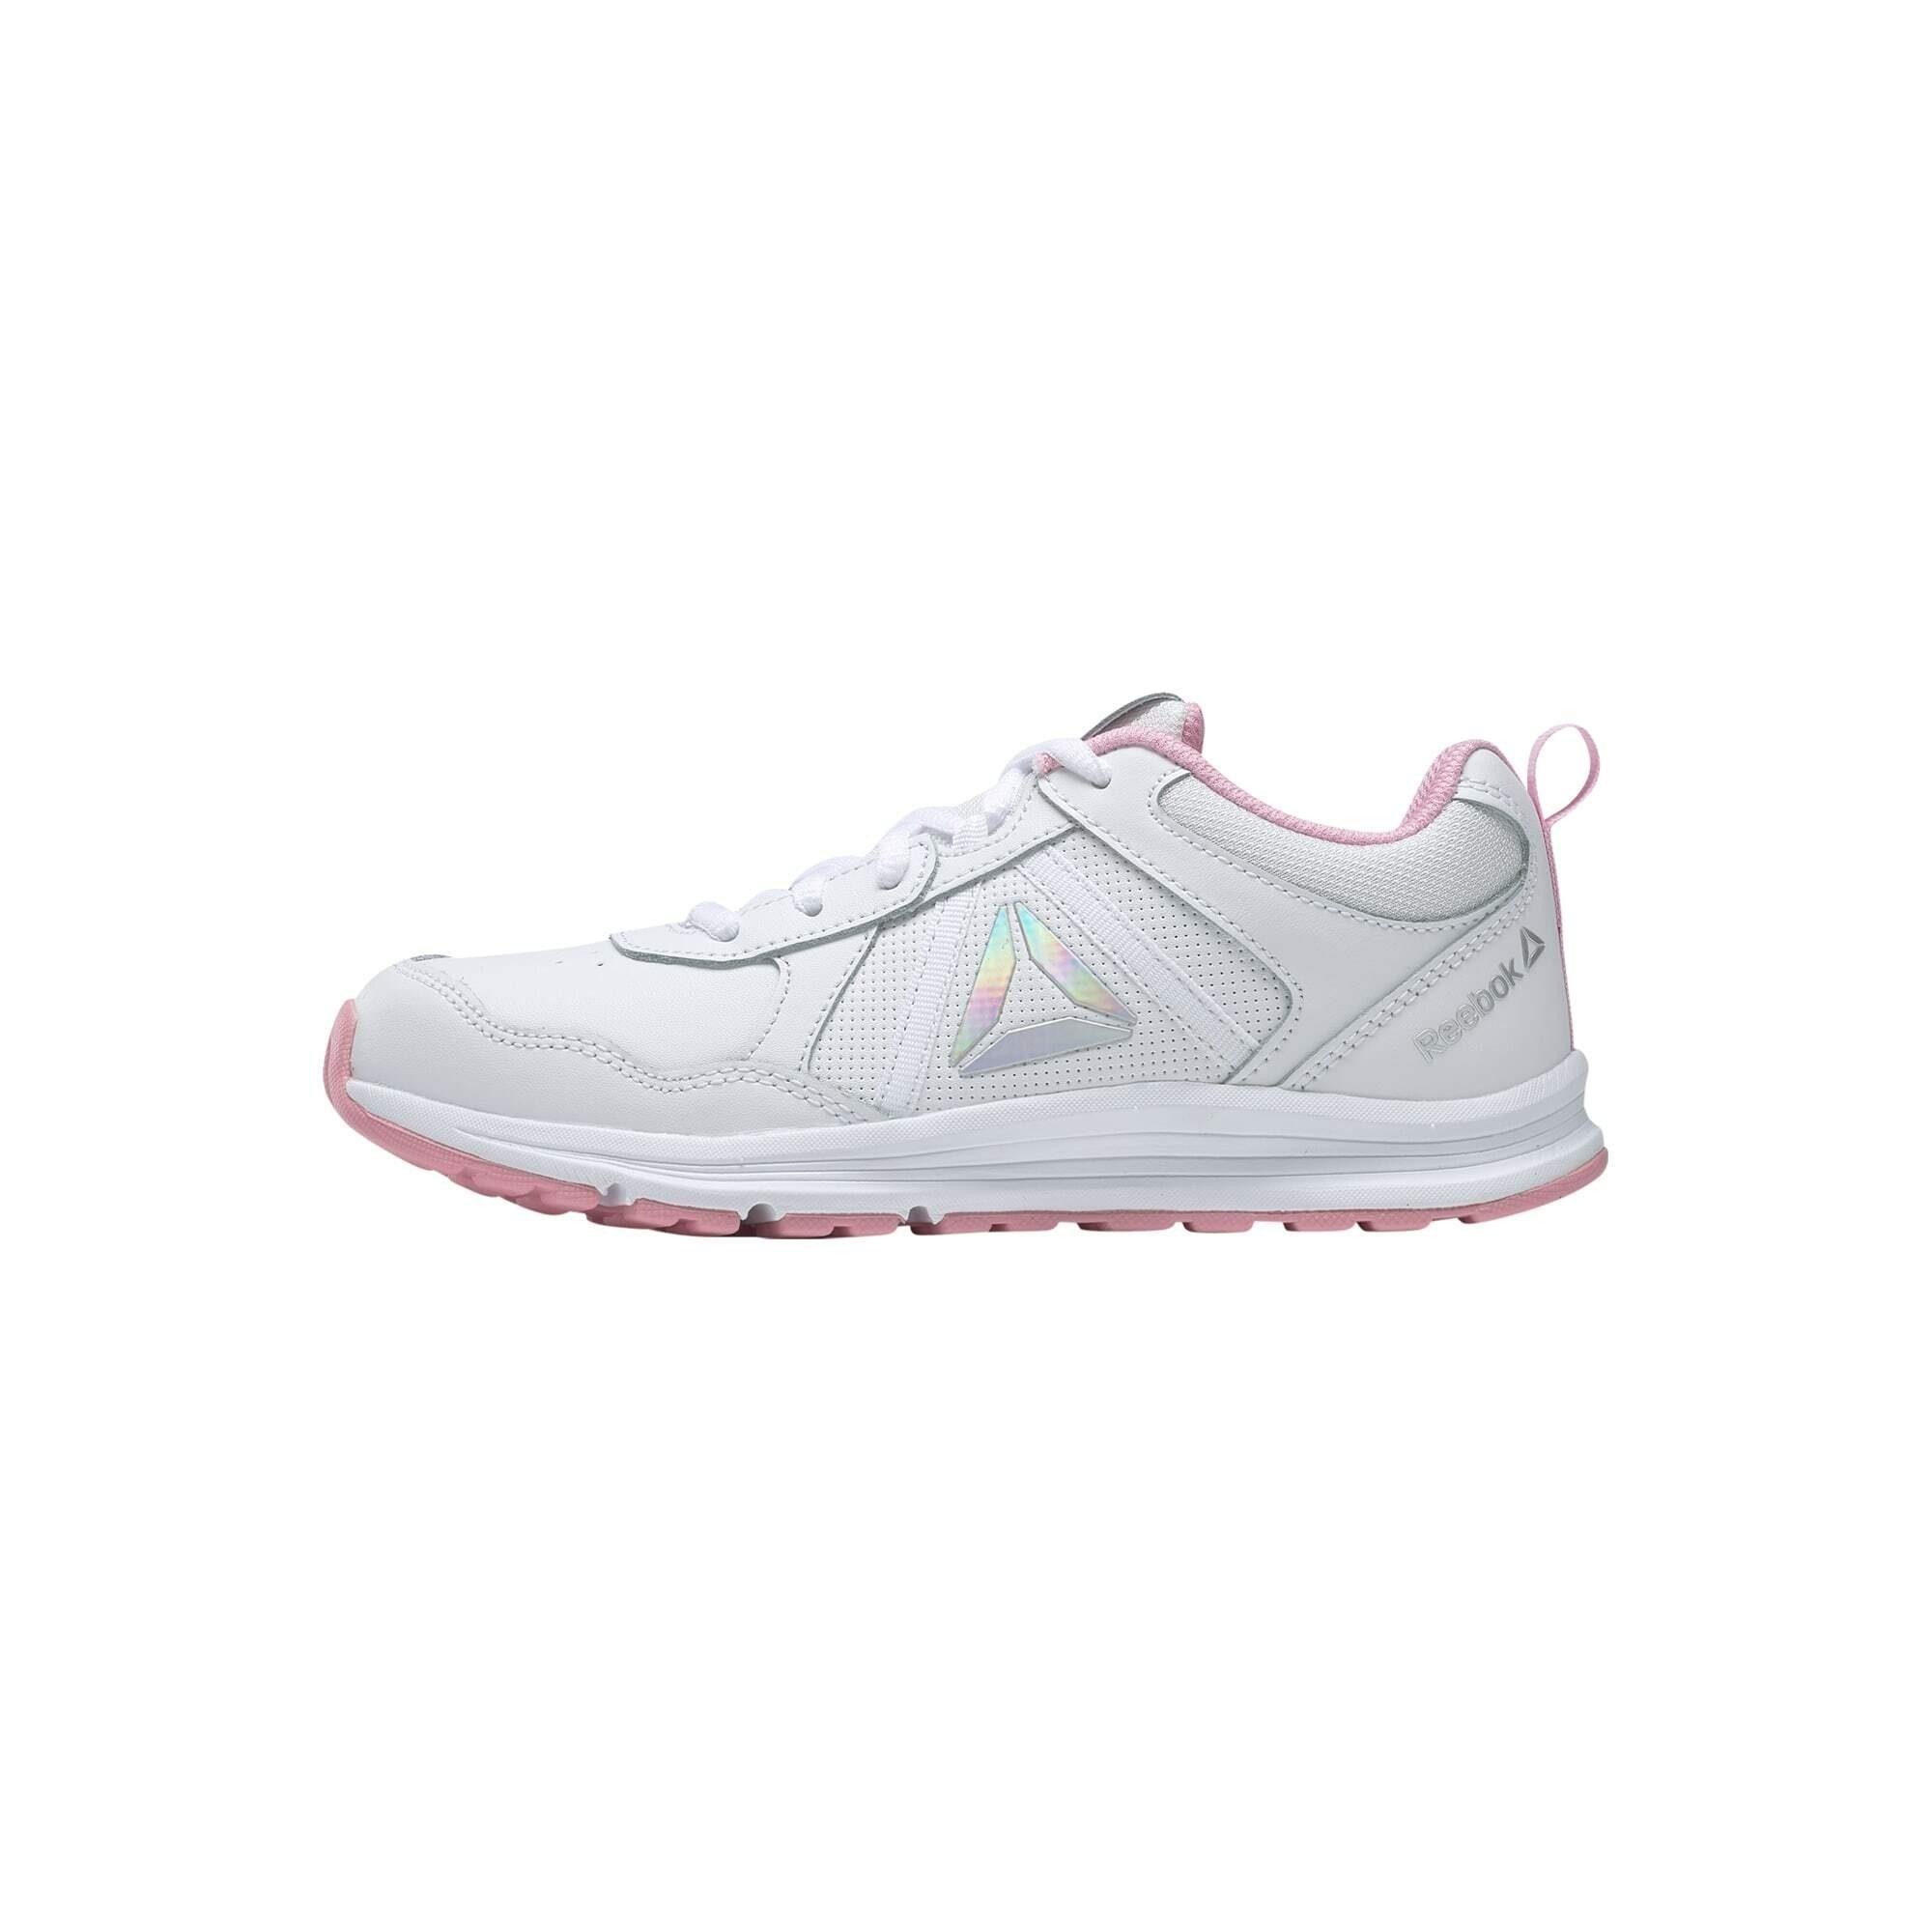 Reebok »Reebok Almotio 4.0 Shoes« Trainingsschuh online kaufen   OTTO